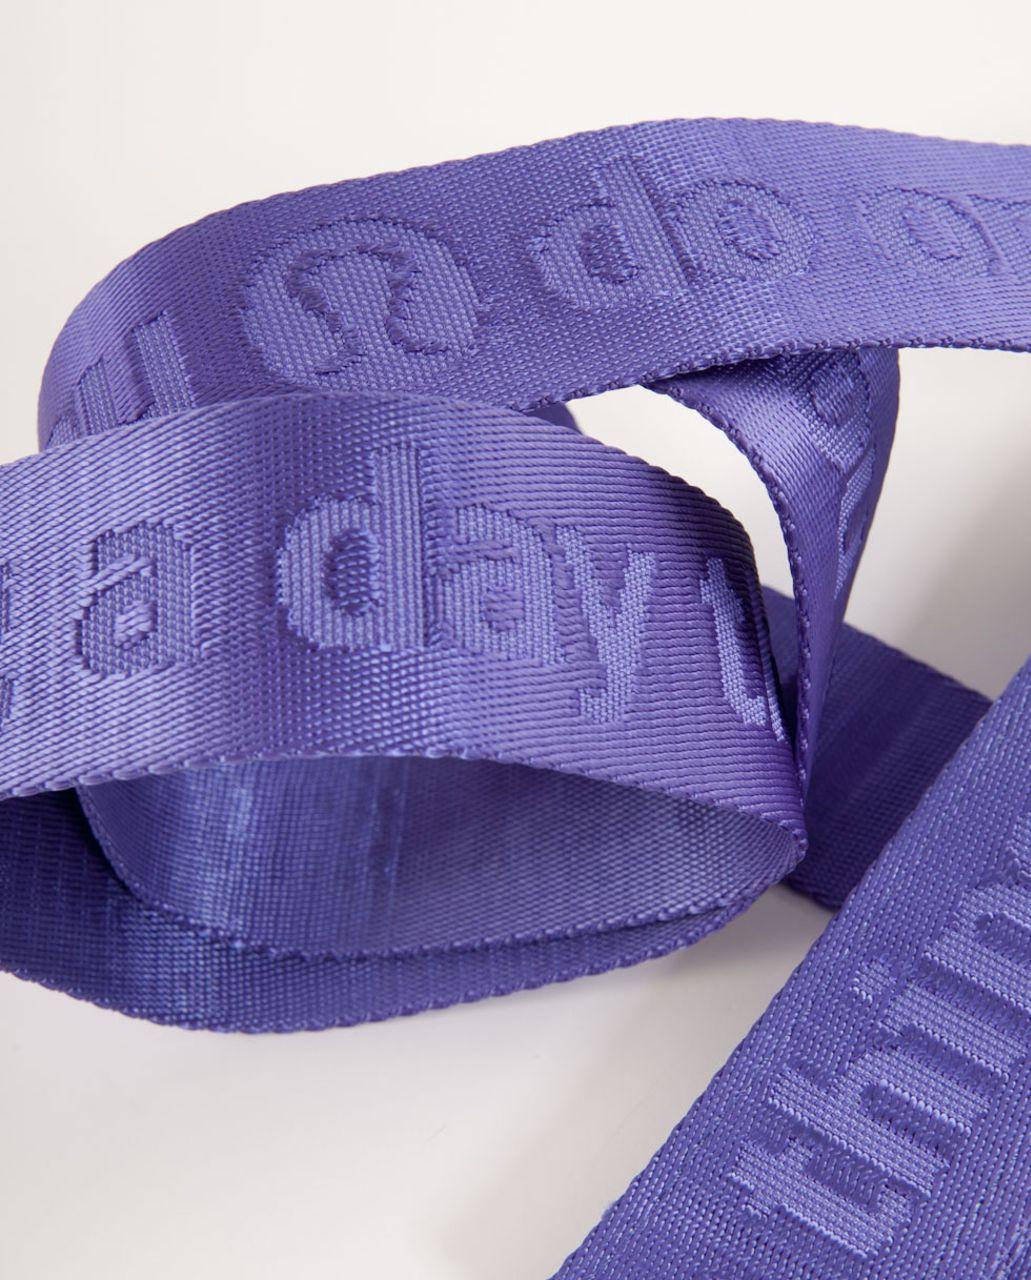 Lululemon No-Brainer Mat Strap - Persian Purple